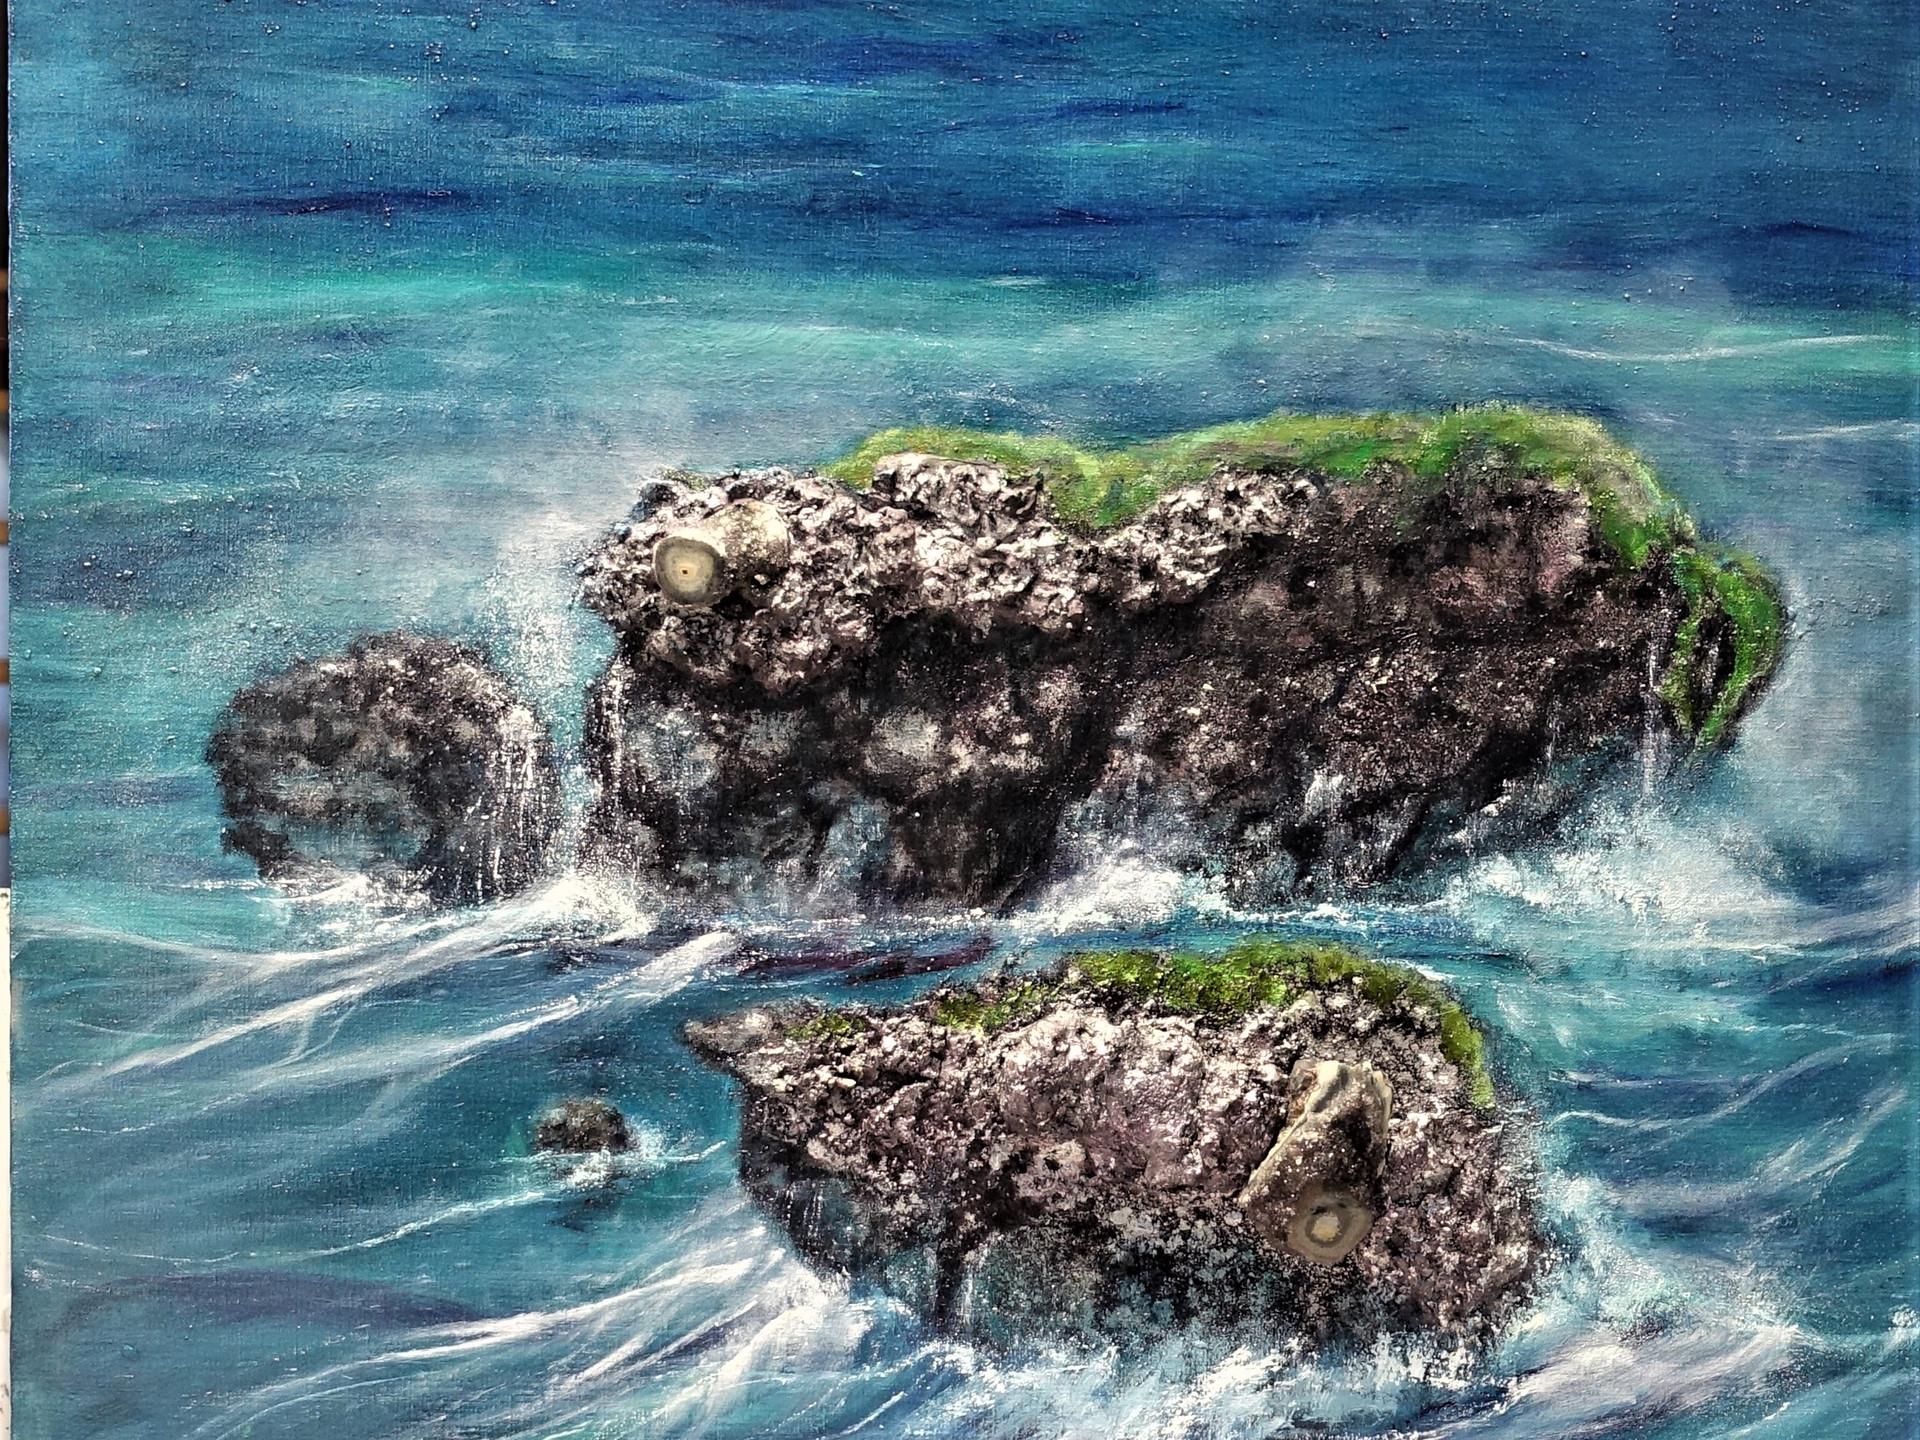 Ojos del mar  OJOS DE STALACTITO 90x90 cm (2 mineralS - oilpainting - mixed media)